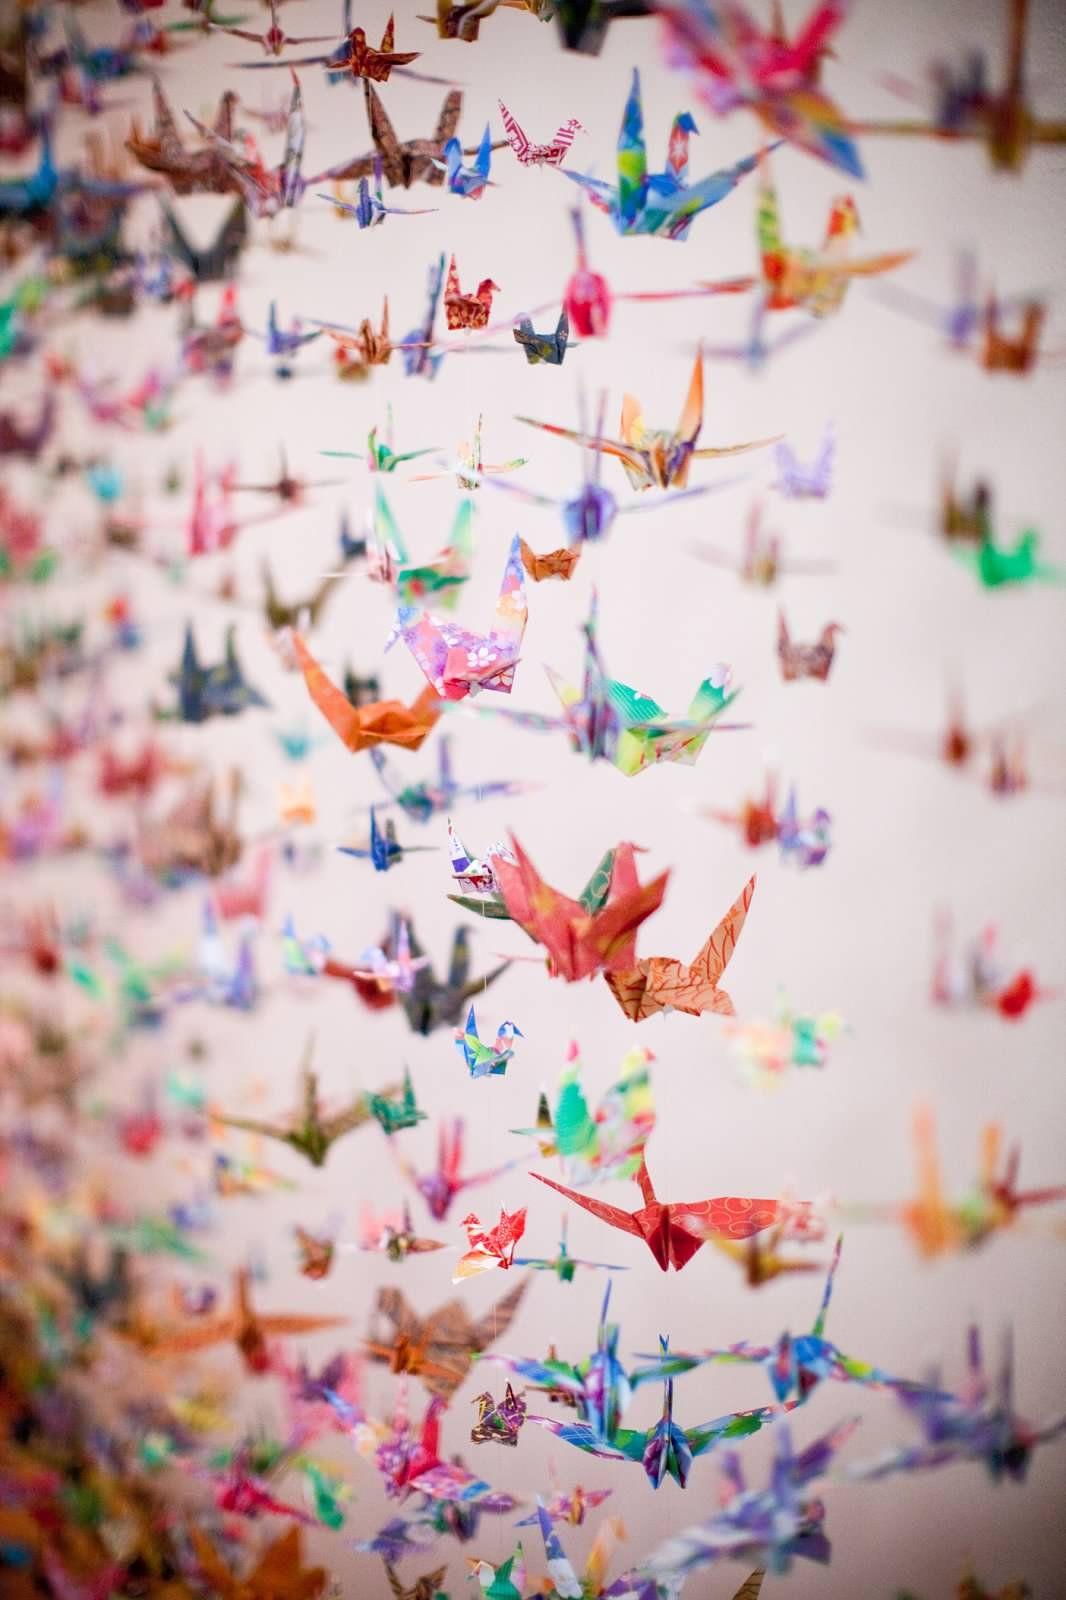 origami crane curtain back drop designed by deko balboa park san diego weddings pinterest. Black Bedroom Furniture Sets. Home Design Ideas